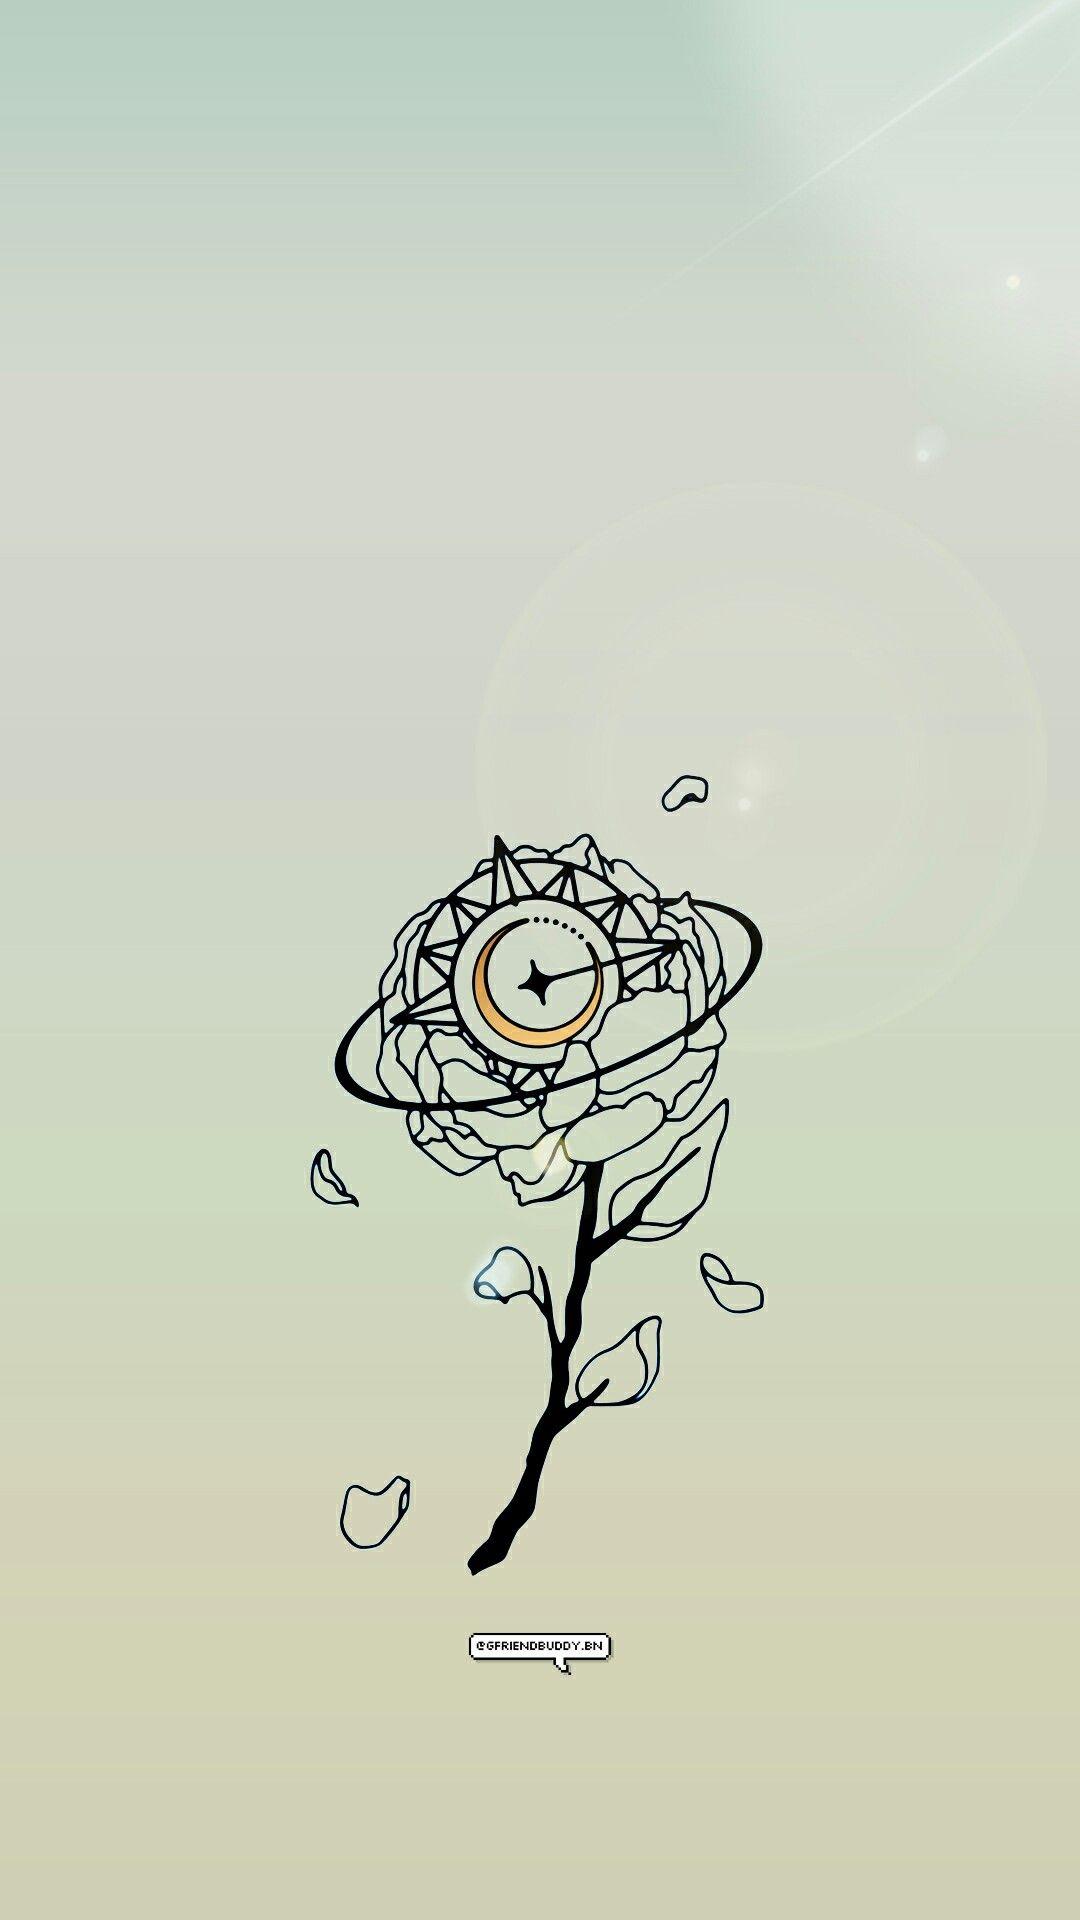 Gfriend Logo Sunrise Time For Us 여자친구 Sowon Yerin Eunha Sinb Yuju Umji Wallpaper Lockscreen Fondo De Pantalla Hd Iphone Gambar Wallpaper Ponsel